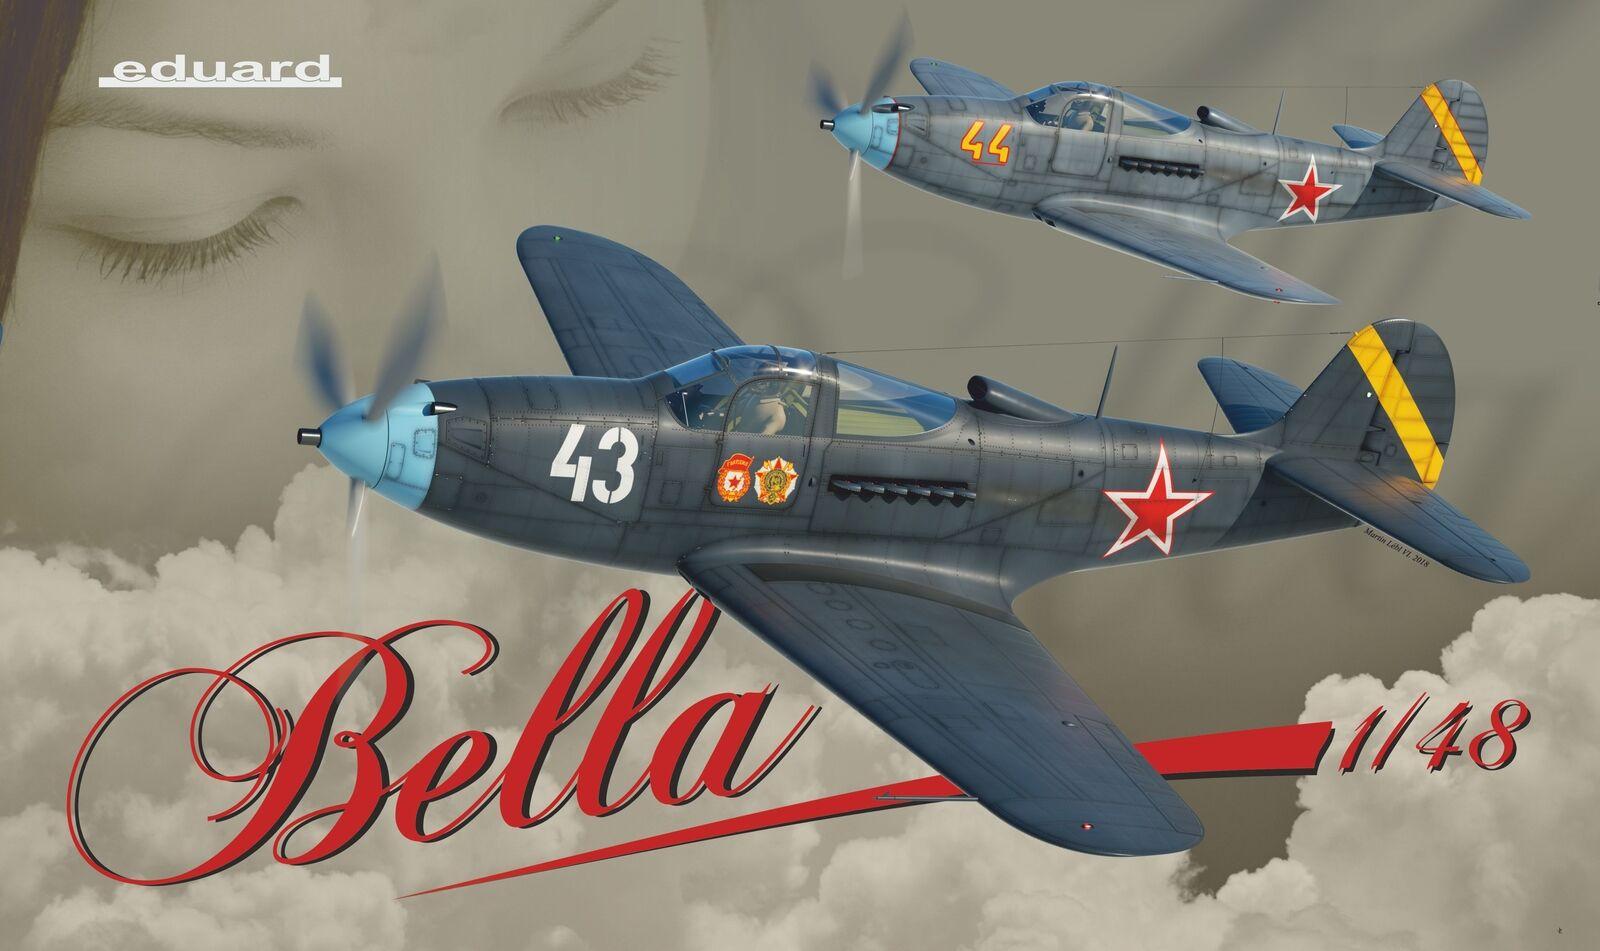 Eduard 1 48 P-39 Airacobra Bella Limited Edition K11118